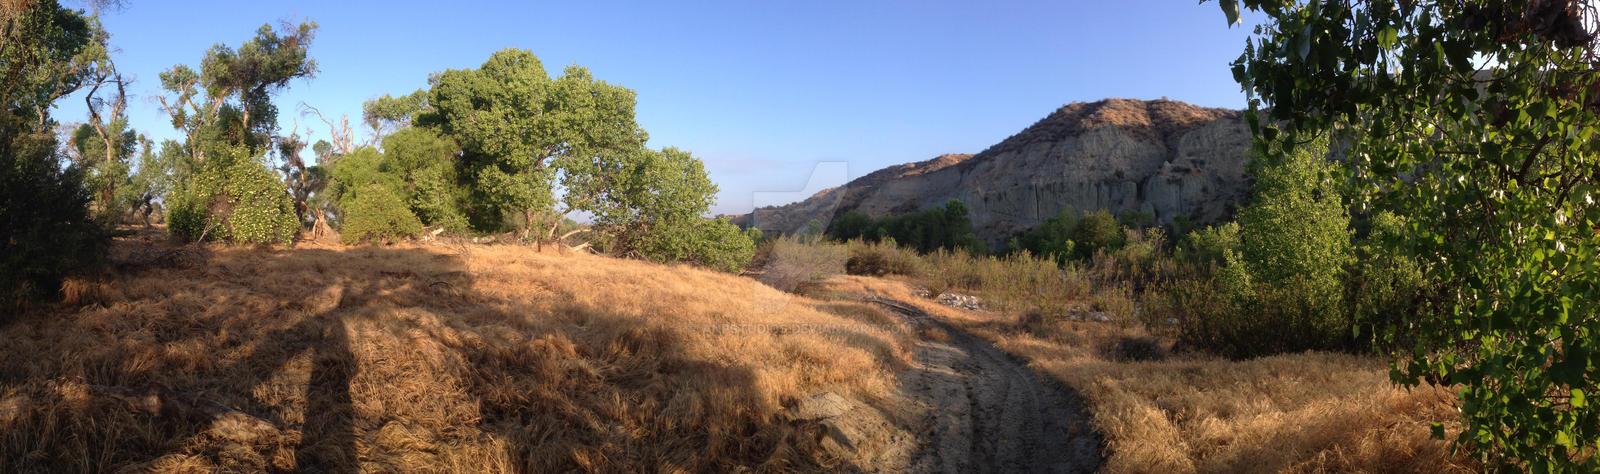 Walking The Morning Trail